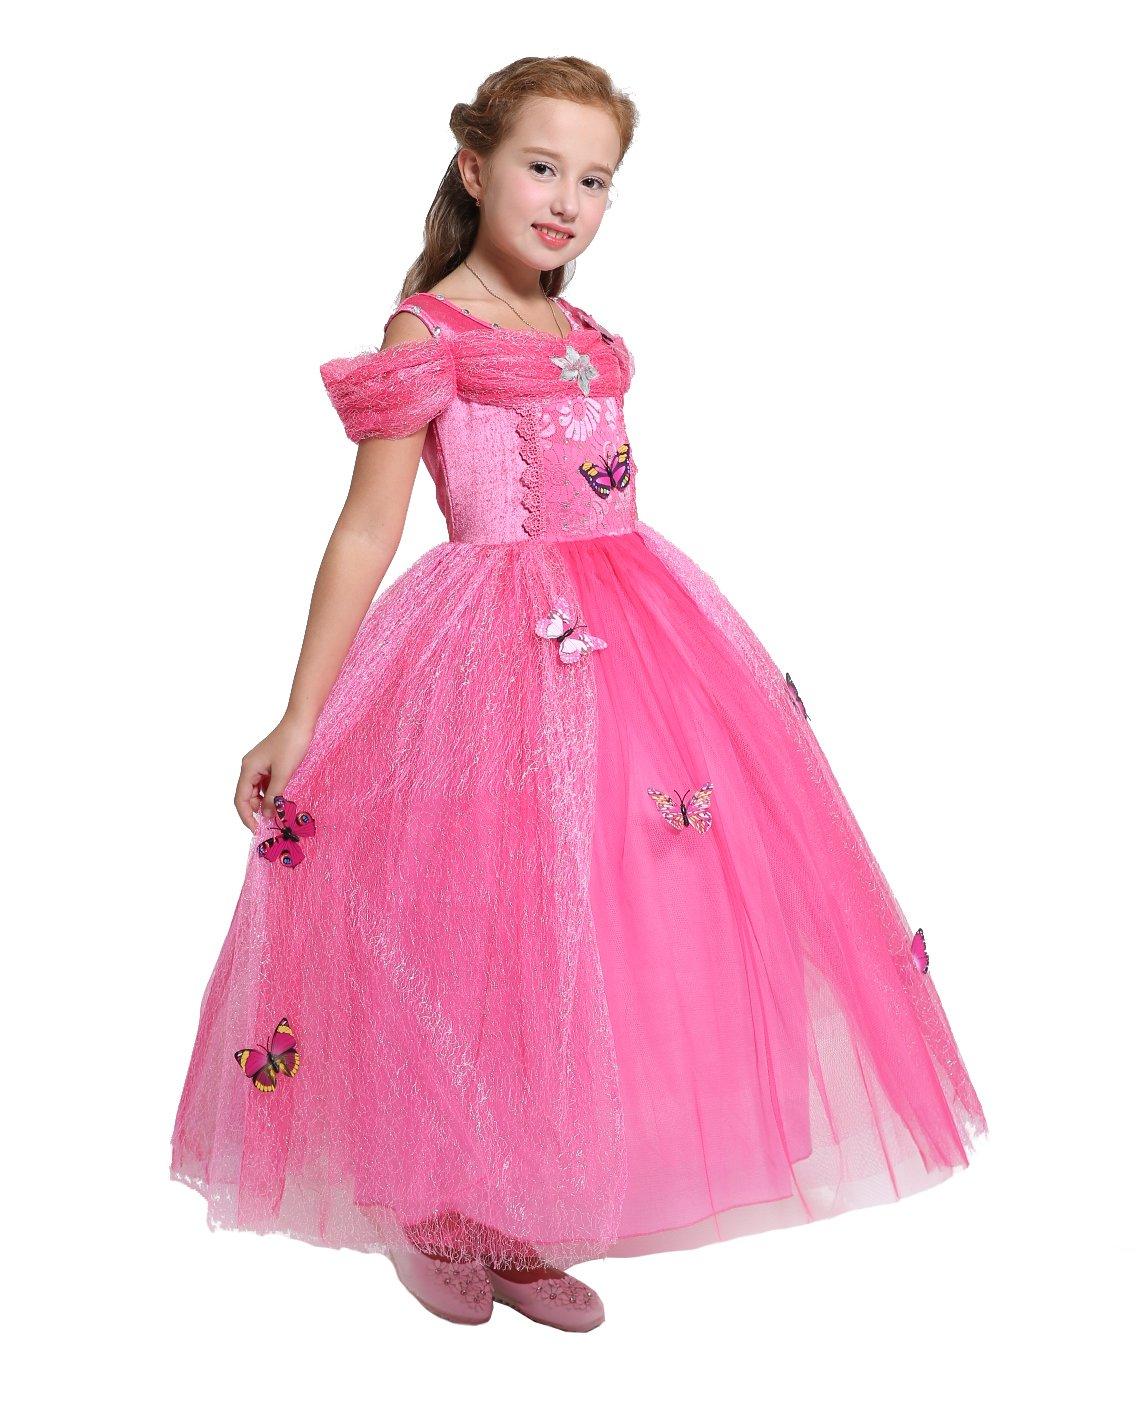 Dressy Daisy Girls' Princess Aurora Costume Princess Dress Halloween Fancy Dress up Size 6X/8